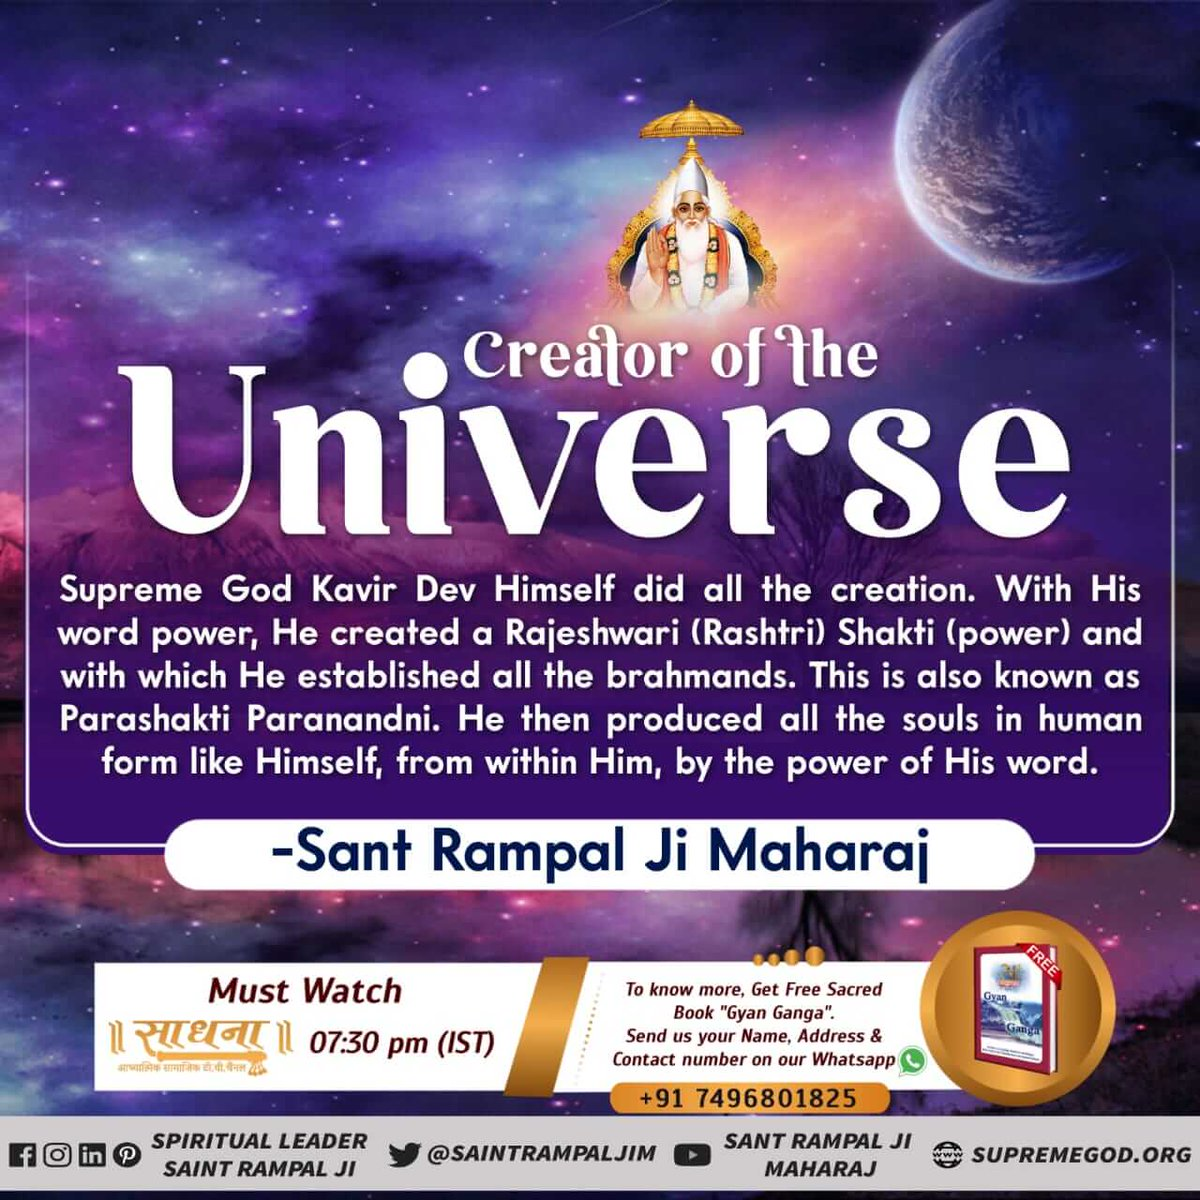 #WednesdayMotivation Creator of universe. Must watch at sadhna tv 7: 30 pm